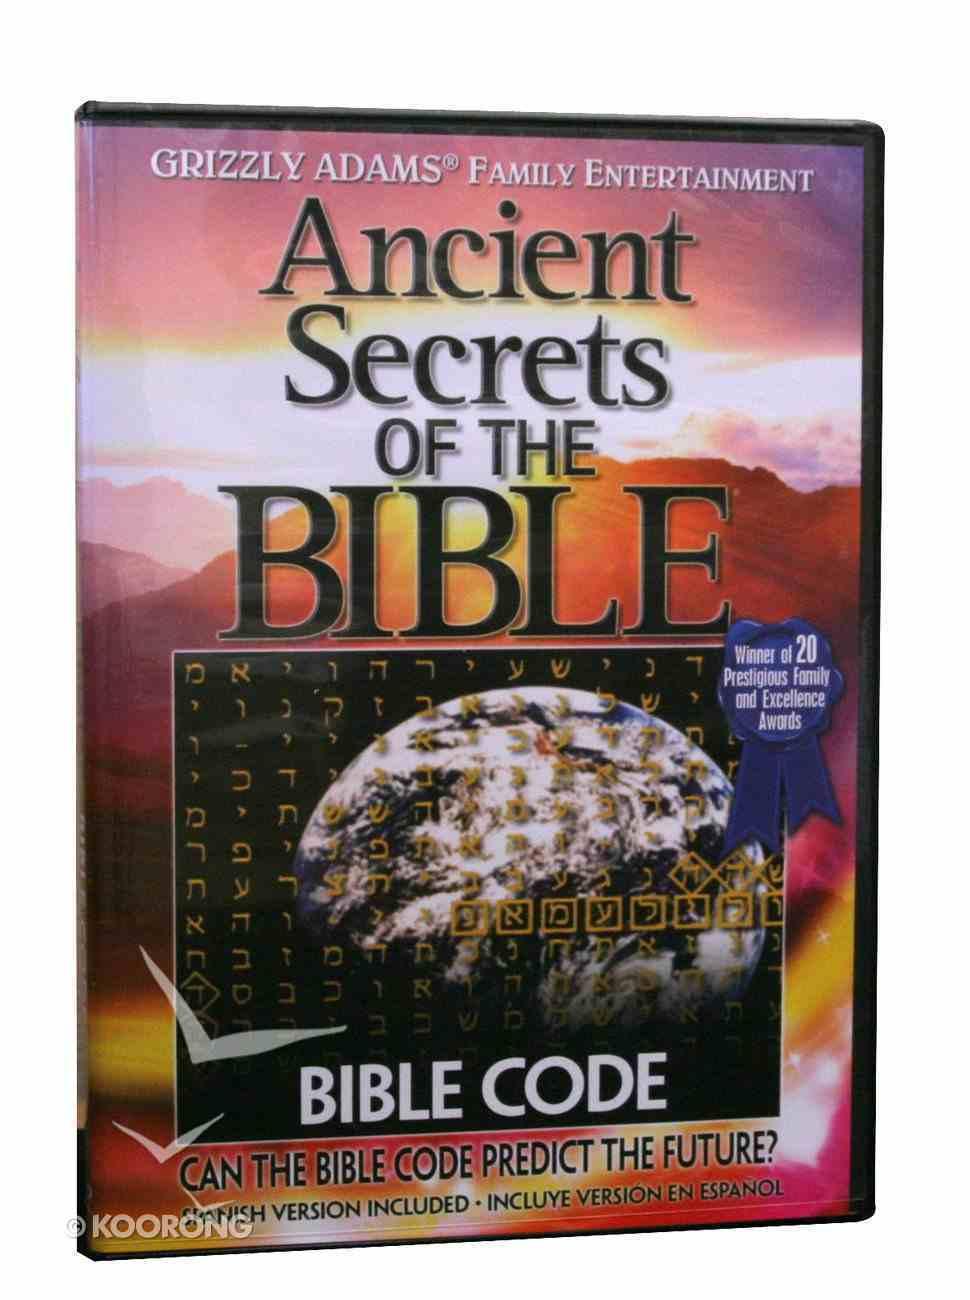 Ancient Secrets 2 #13: Bible Code (Ancient Secrets Of The Bible Dvd Series) DVD